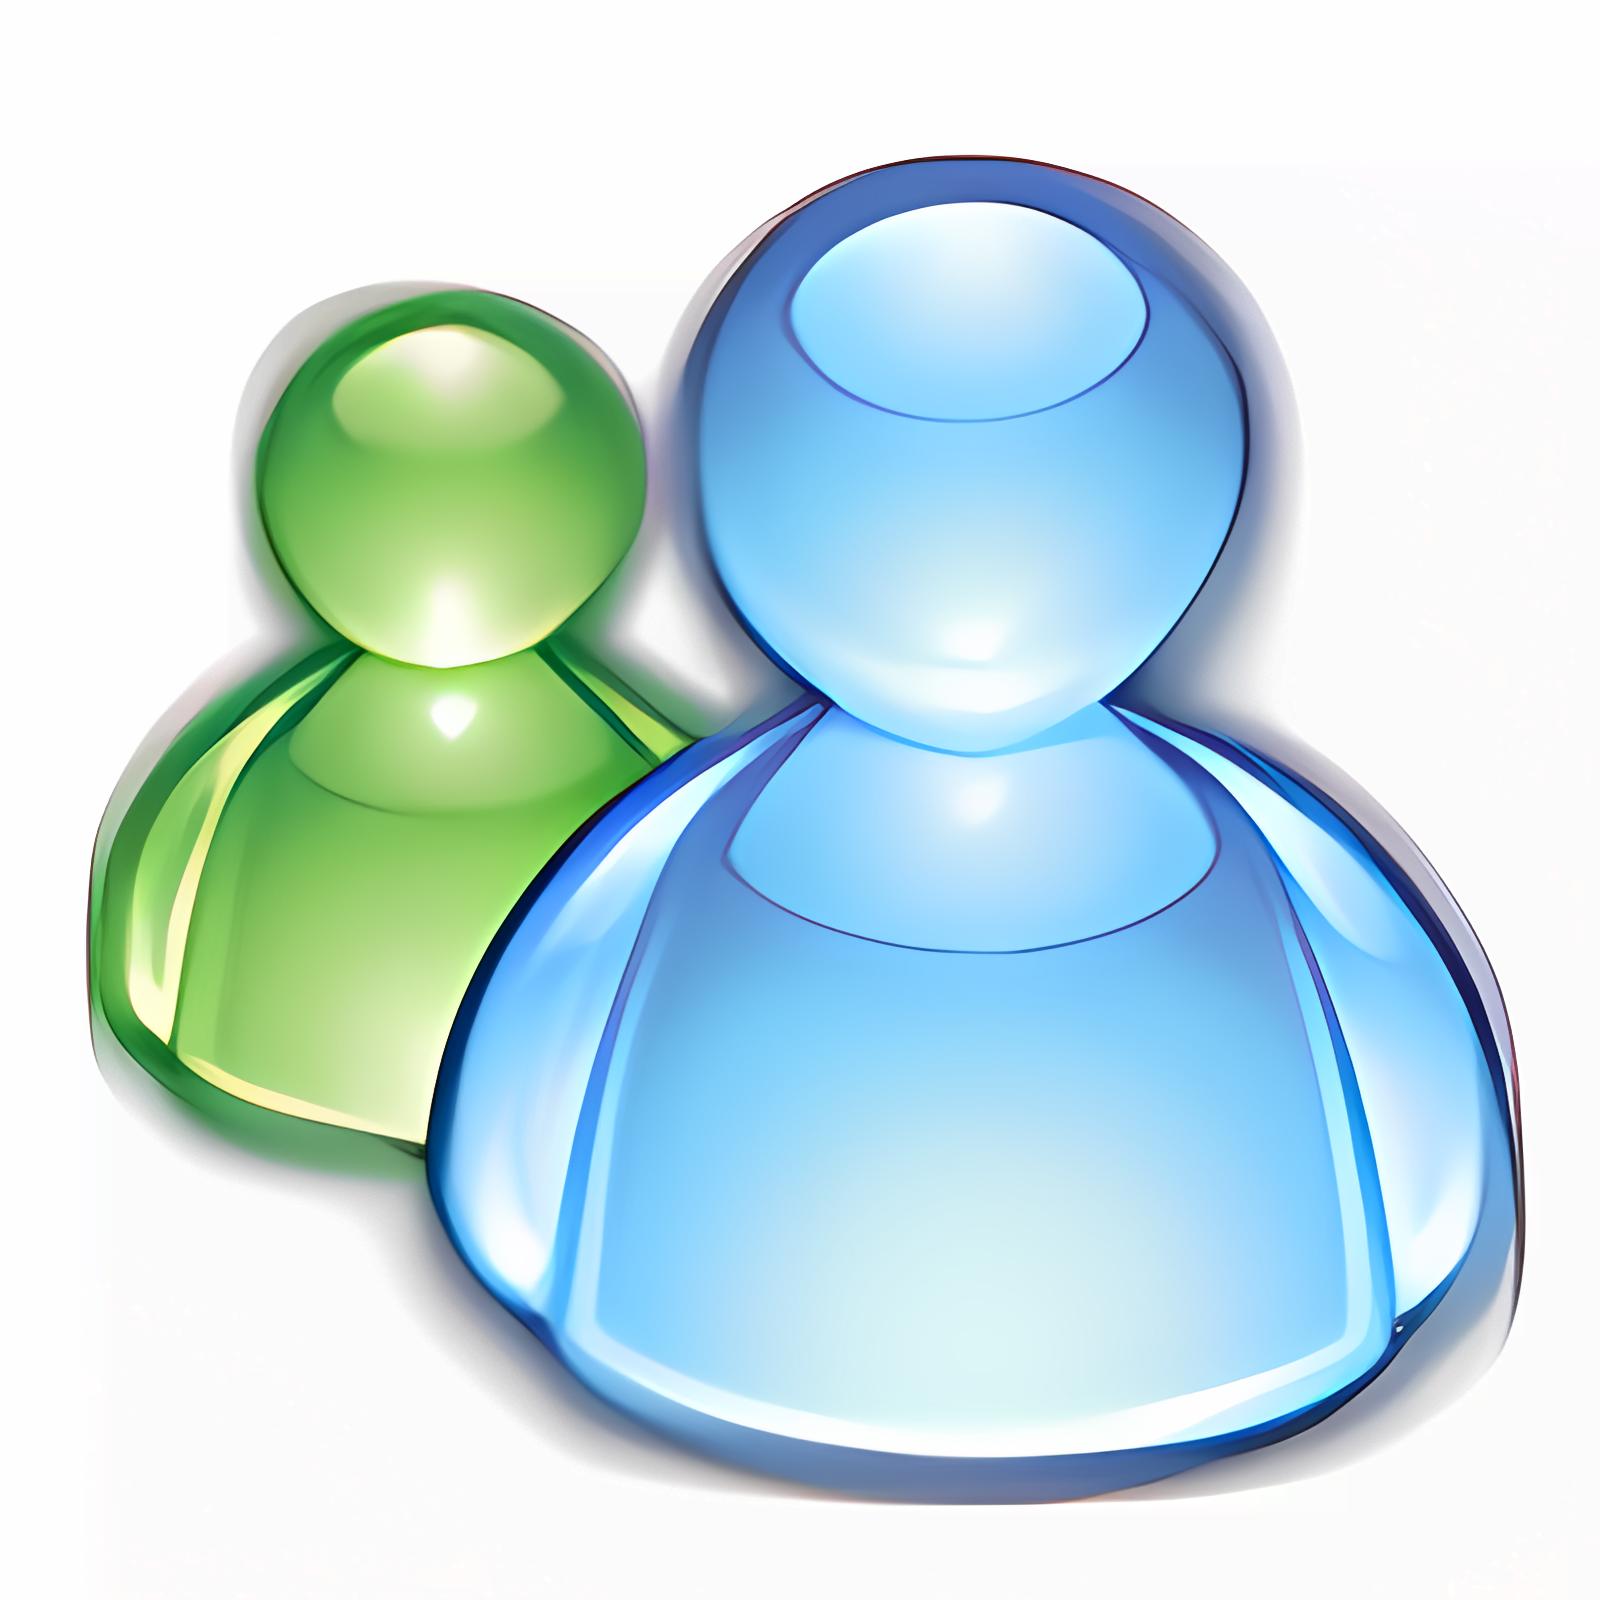 Windows Live Messenger 2009 XP 14.0.8117.416